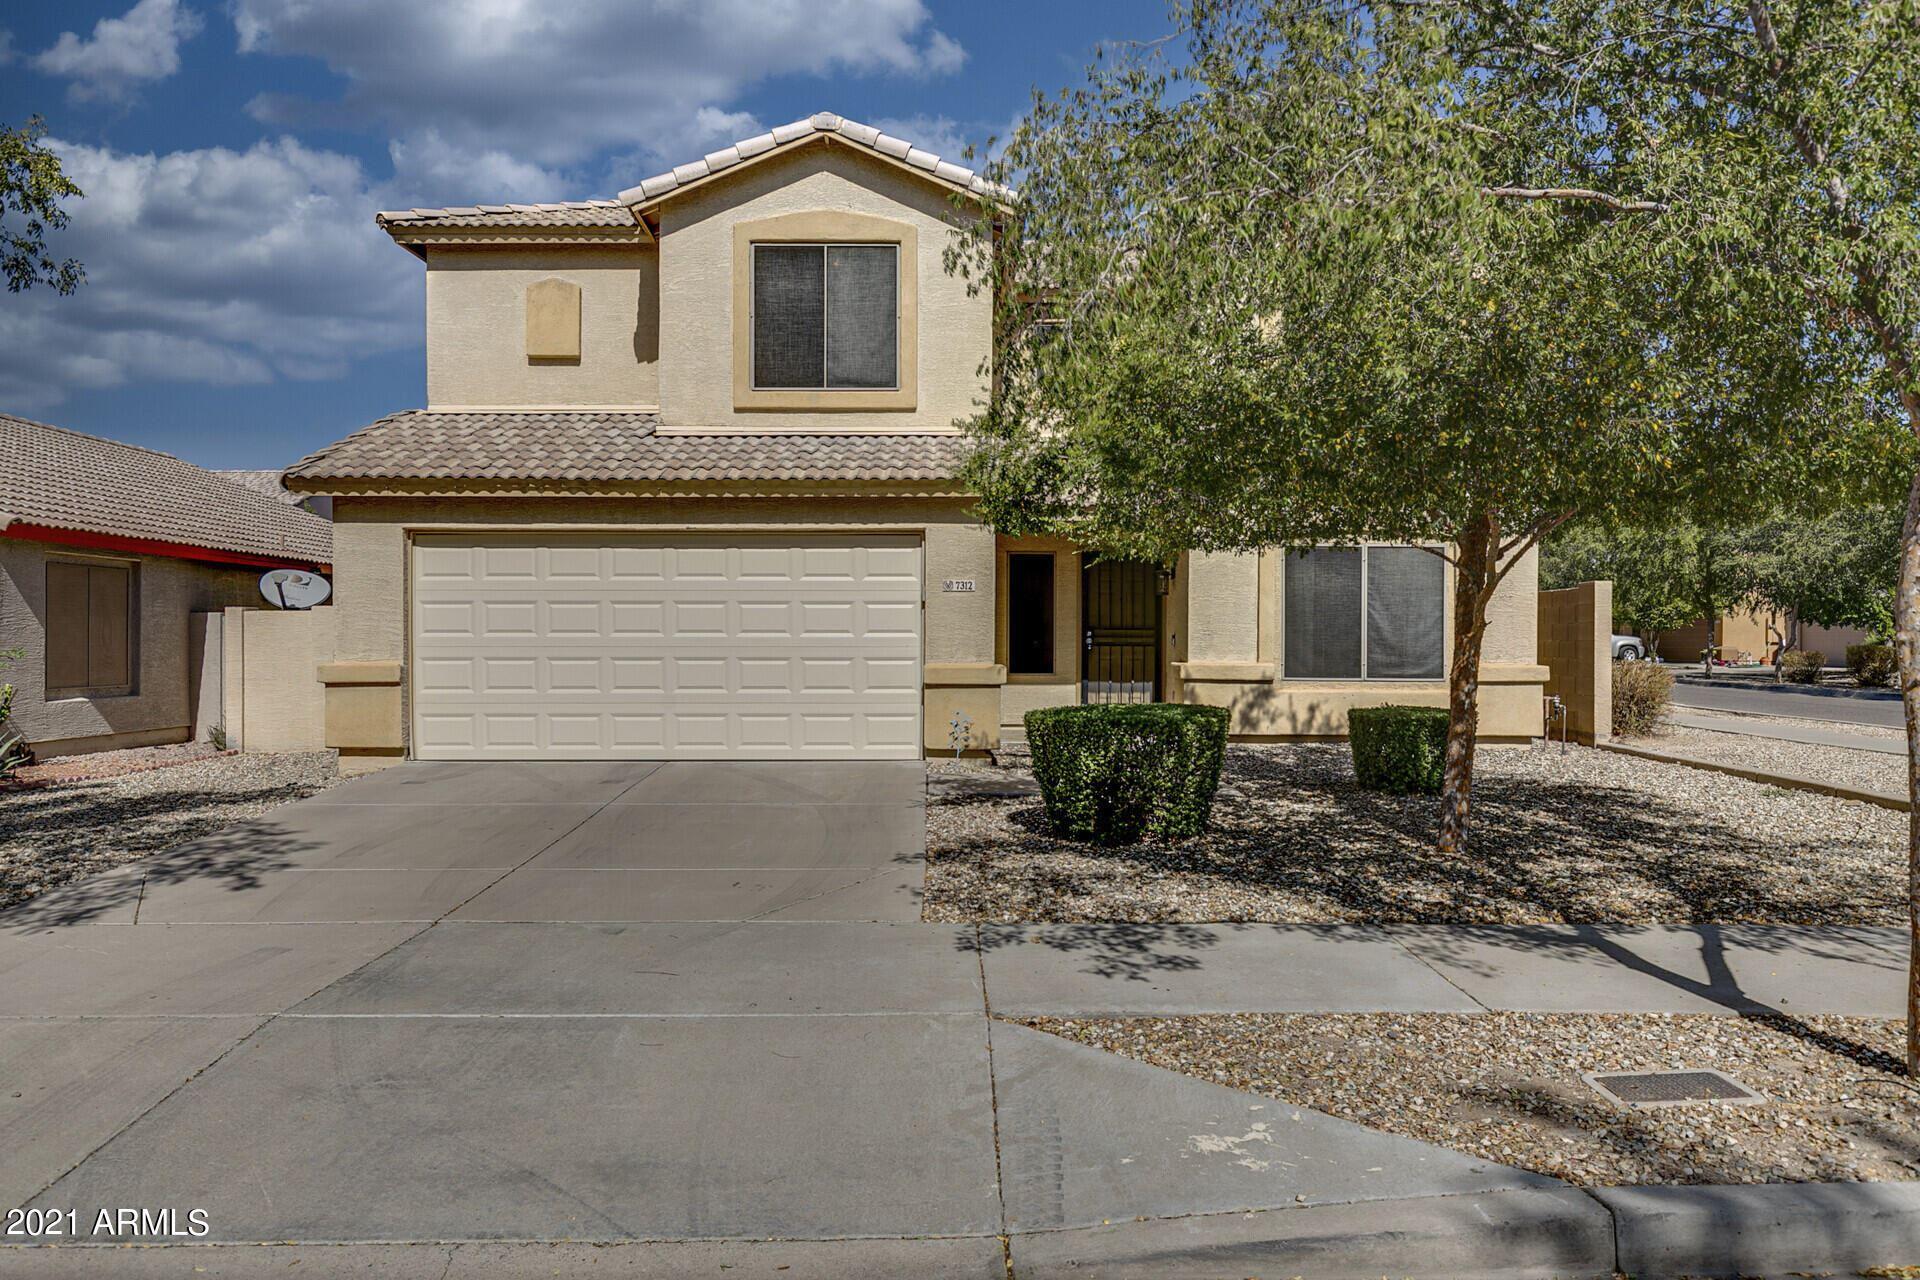 7312 W FLORENCE Avenue W, Phoenix, AZ 85043 - MLS#: 6311010